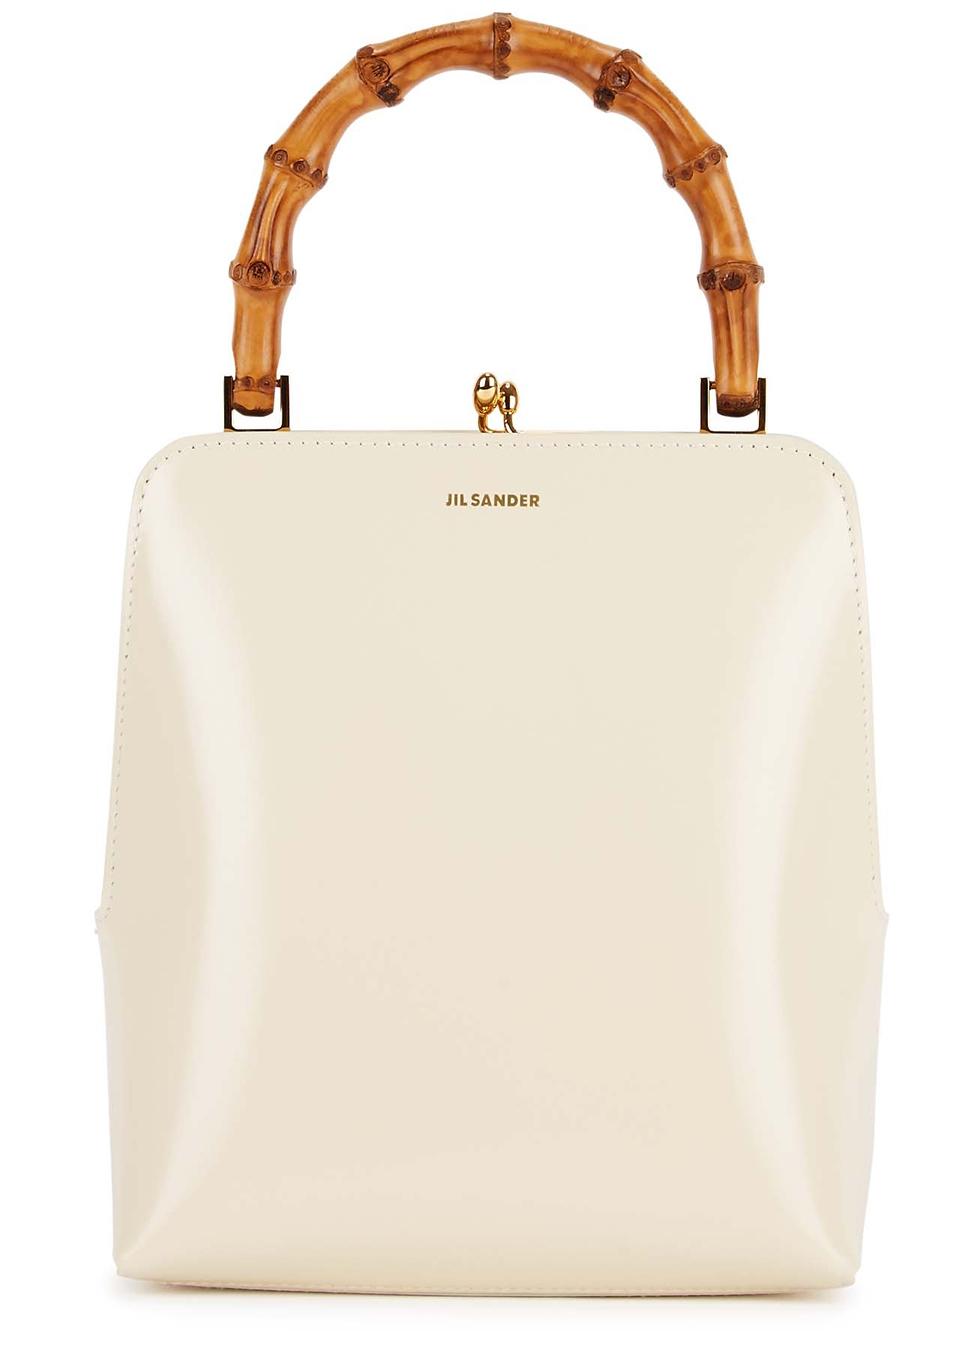 Goji cream leather top handle bag